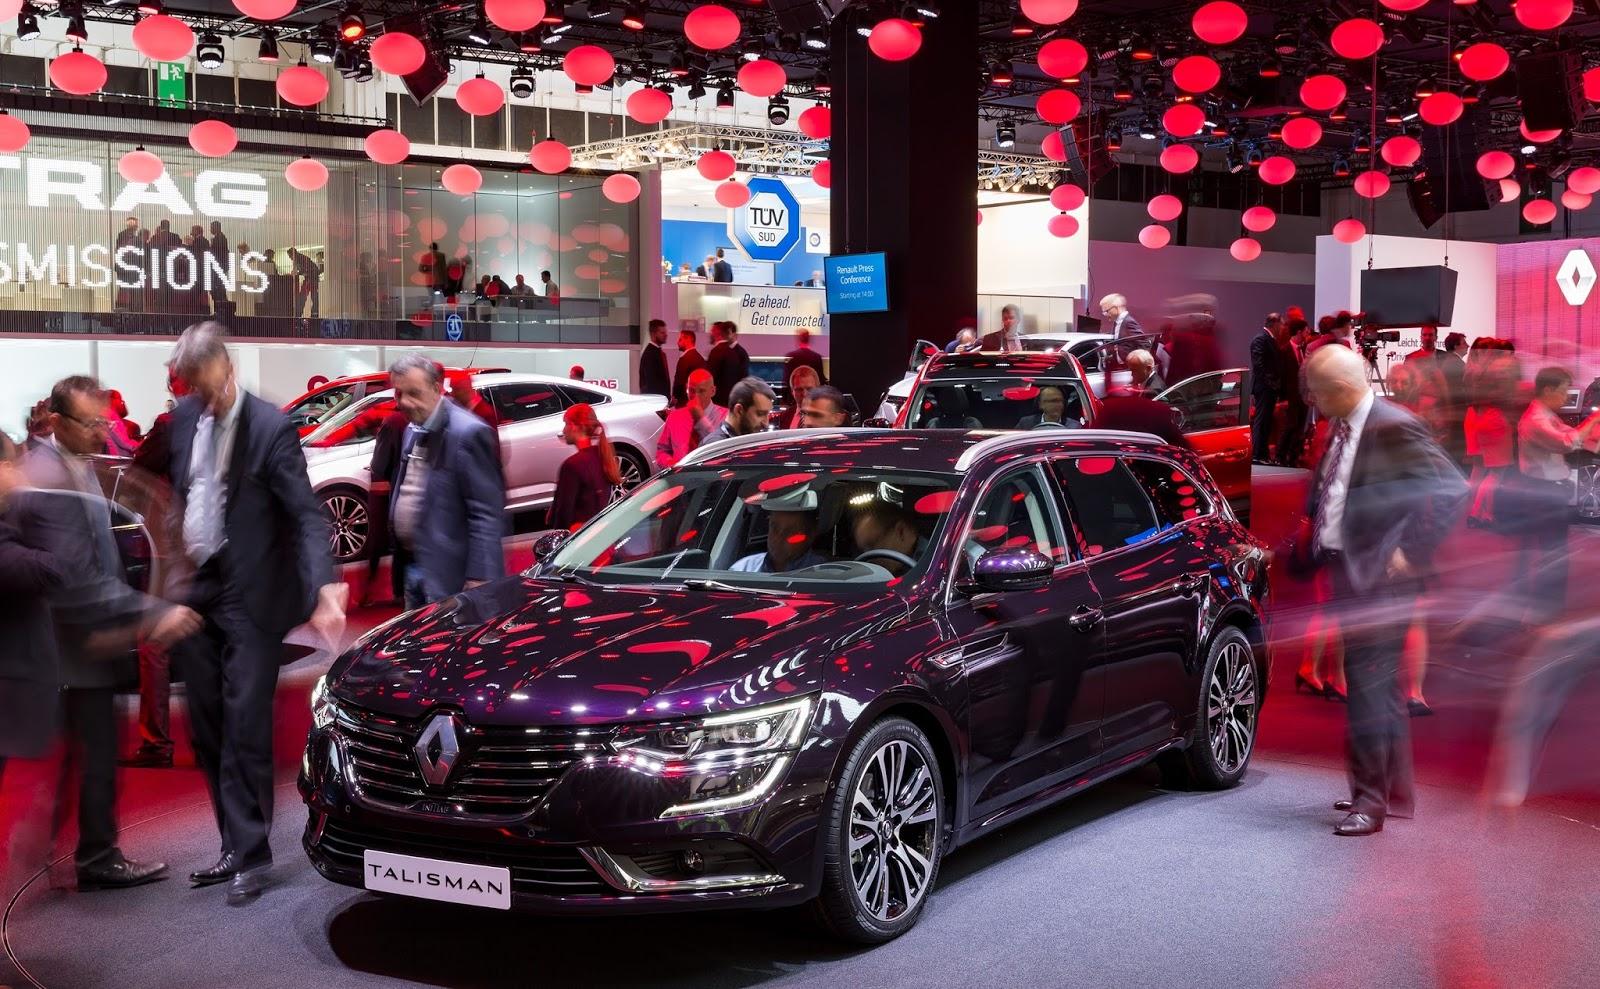 N%25CE%25AD%25CE%25BF Renault TALISMAN ESTATE Το νέο Renault Mégane παρουσιάστηκε στην διεθνή έκθεση της Φρανκφούρτης με έκδοση GT και 205 ίππους Renault, Renault Megane, Renault Talisman, Renault Talisman Estate, ΣΑΛΟΝΙ ΑΥΤΟΚΙΝΗΤΟΥΦΡΑΝΚΦΟΥΡΤΗΣ 2015